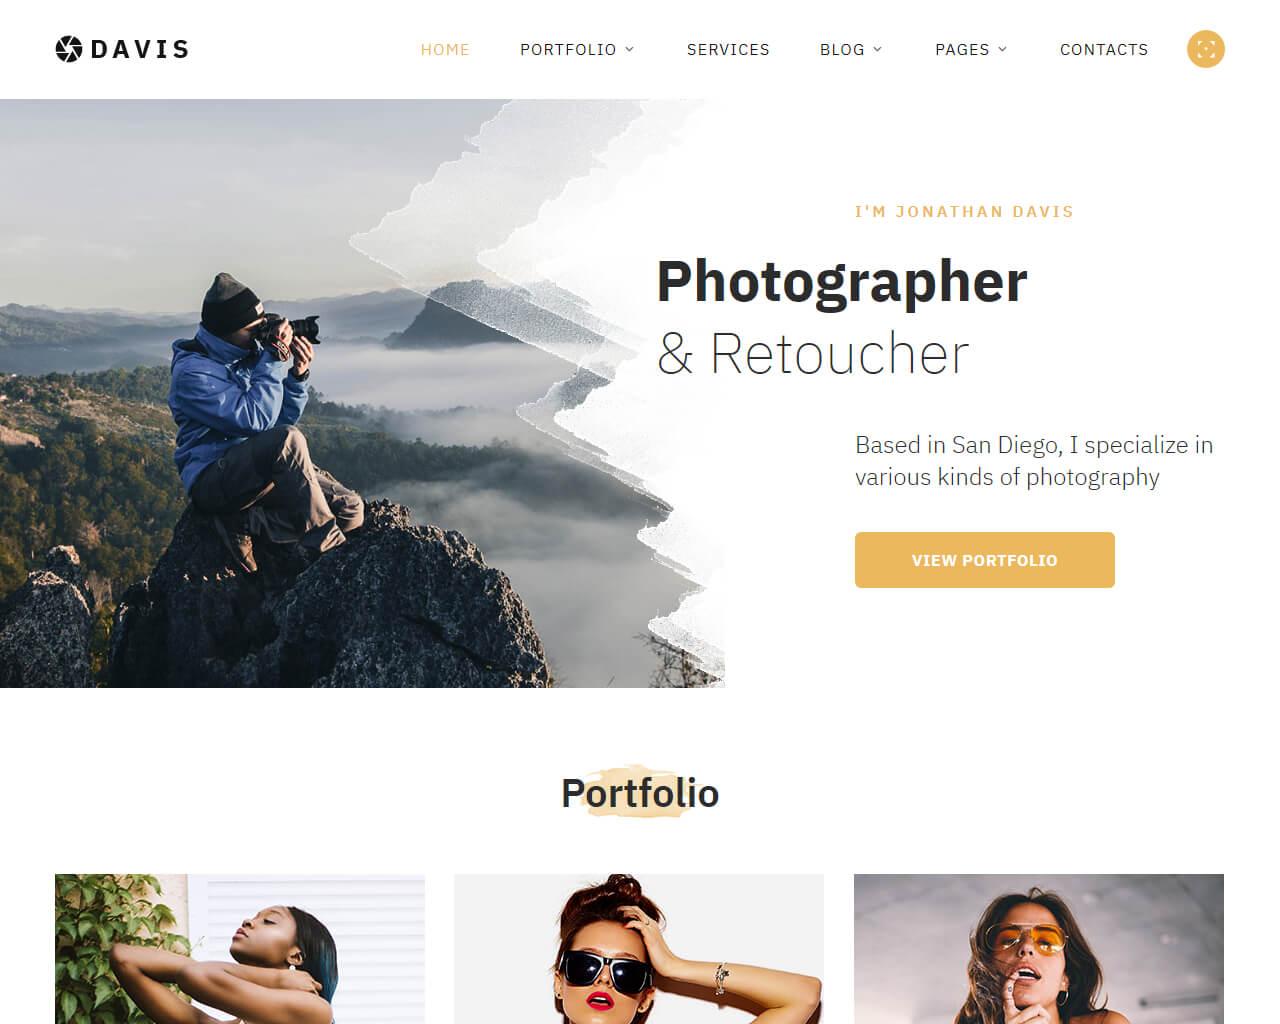 Davis Website Template